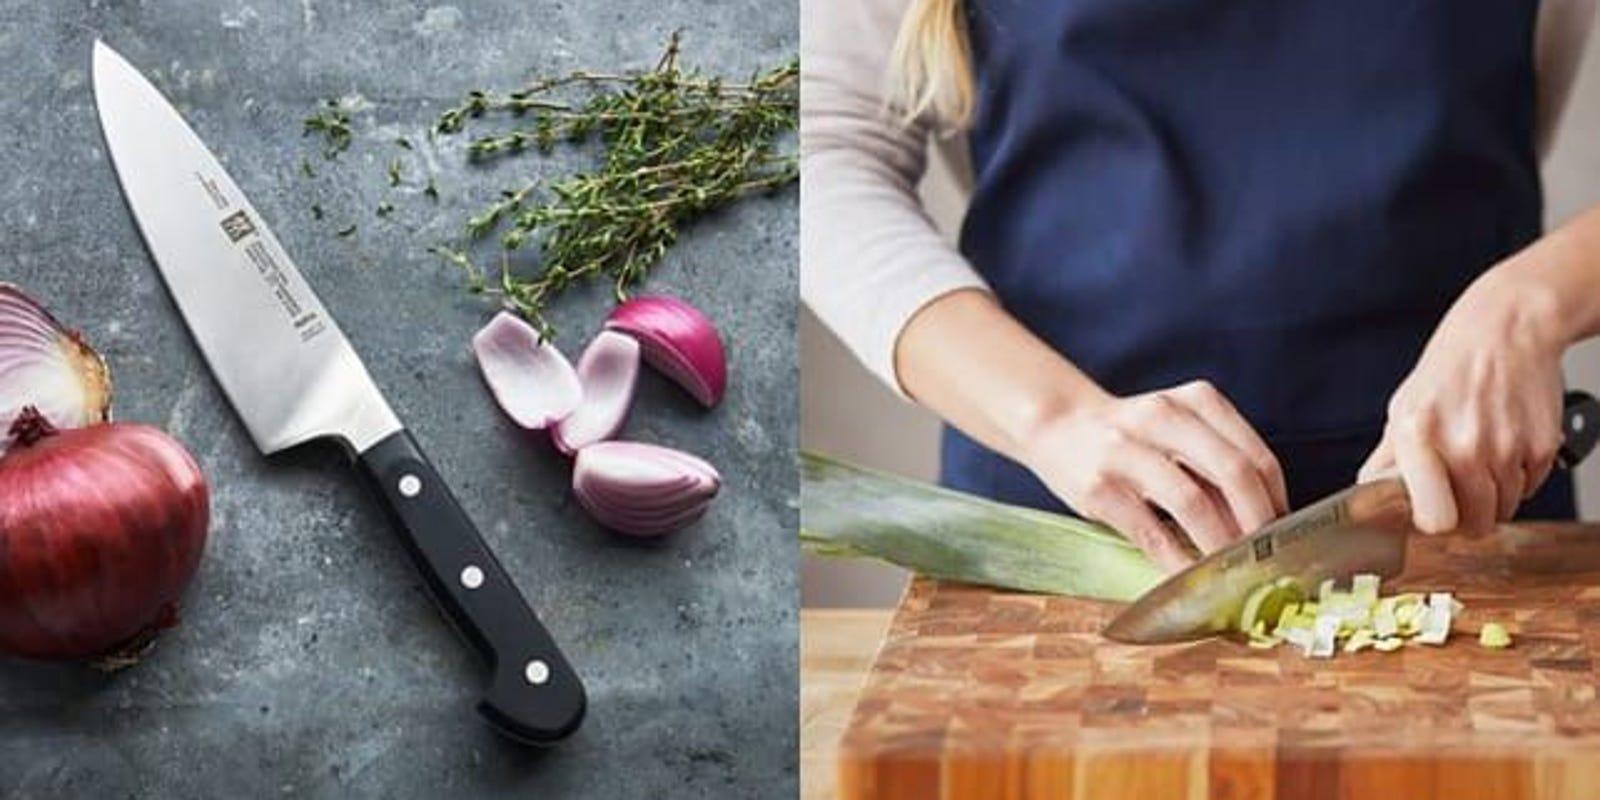 Get this super-sharp knife set at a major discount